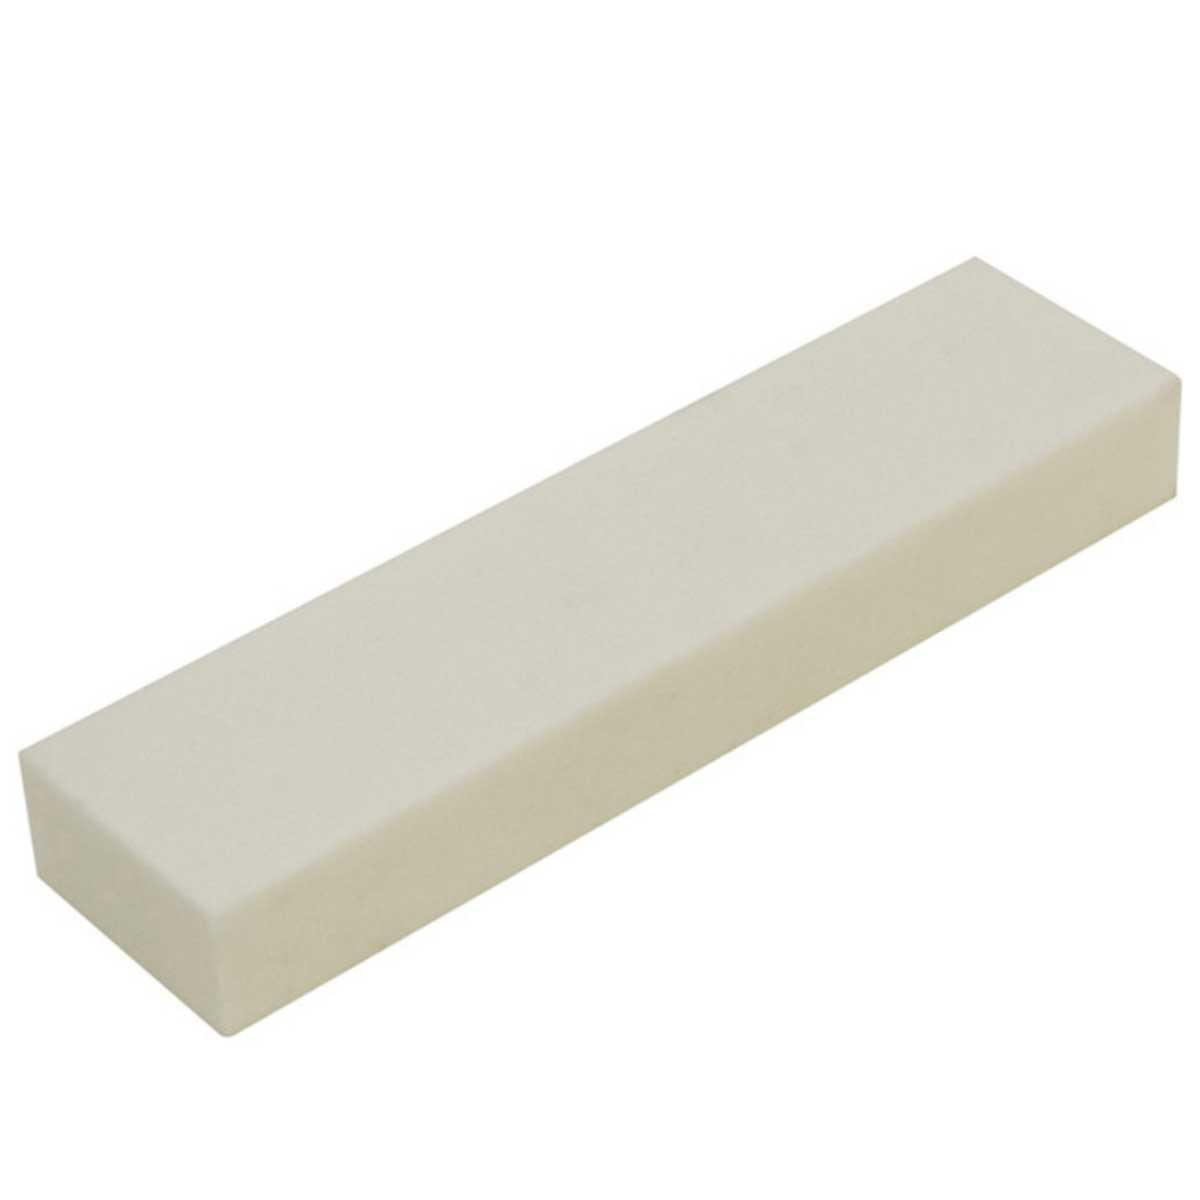 Marshalltown White Medium 60 grit Conditioning Stick 15382